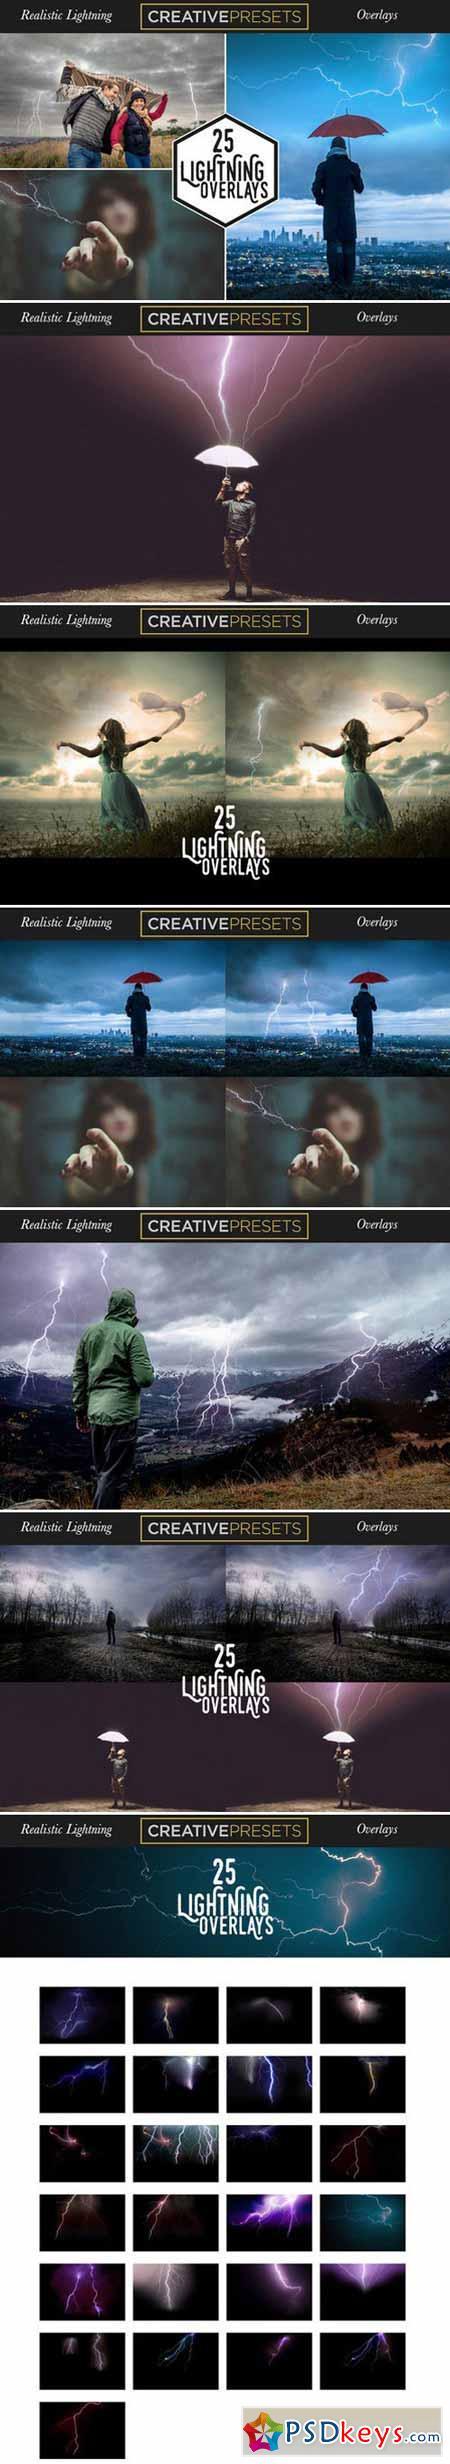 25 Realistic Lightning Overlays 398026